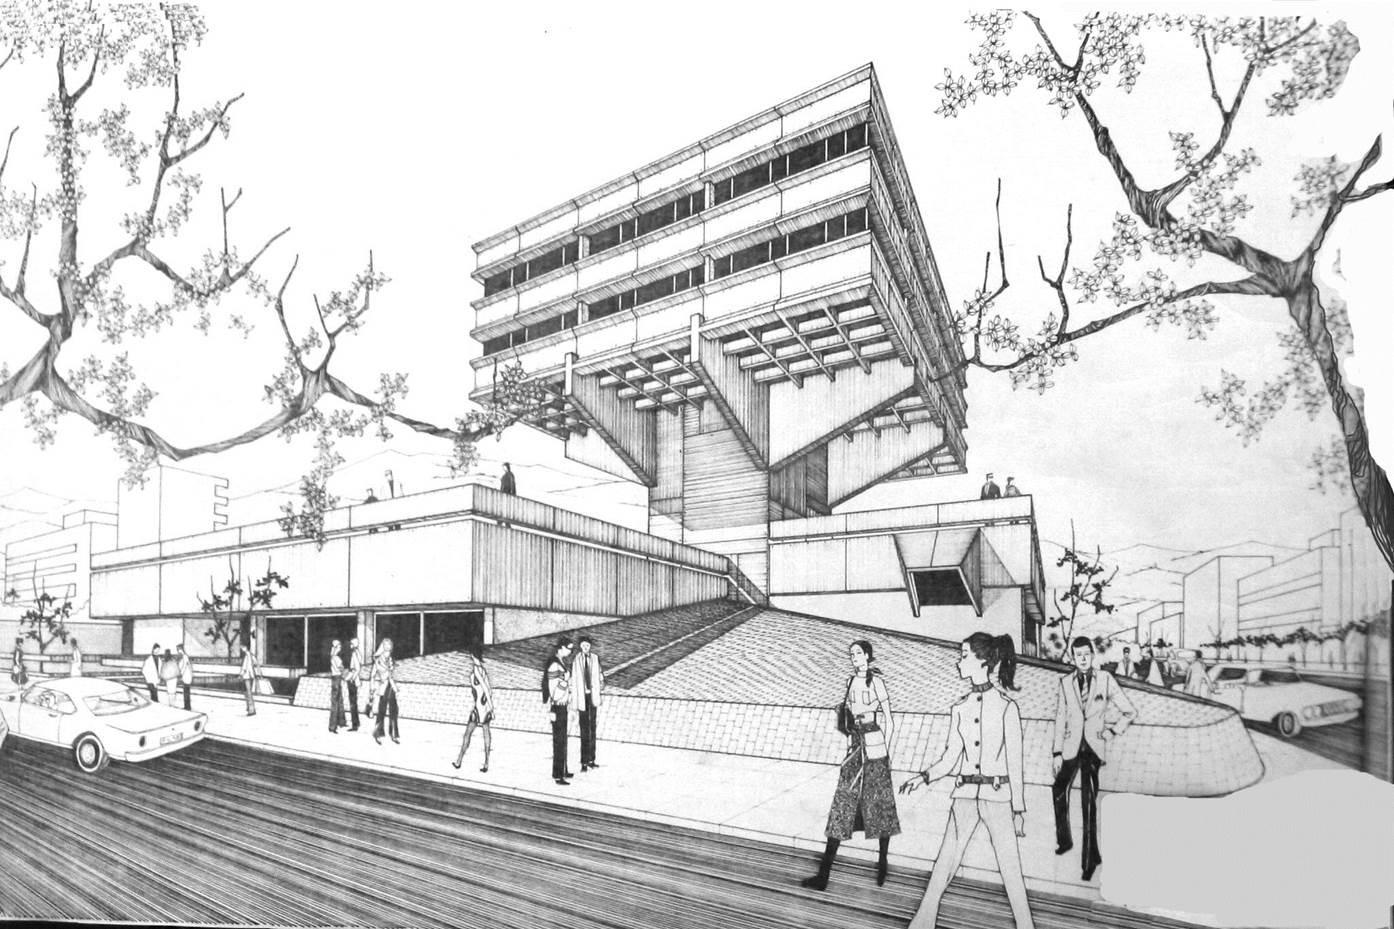 Milton barrag n 80 a os de arquitectura brutalista en for En que universidades hay arquitectura